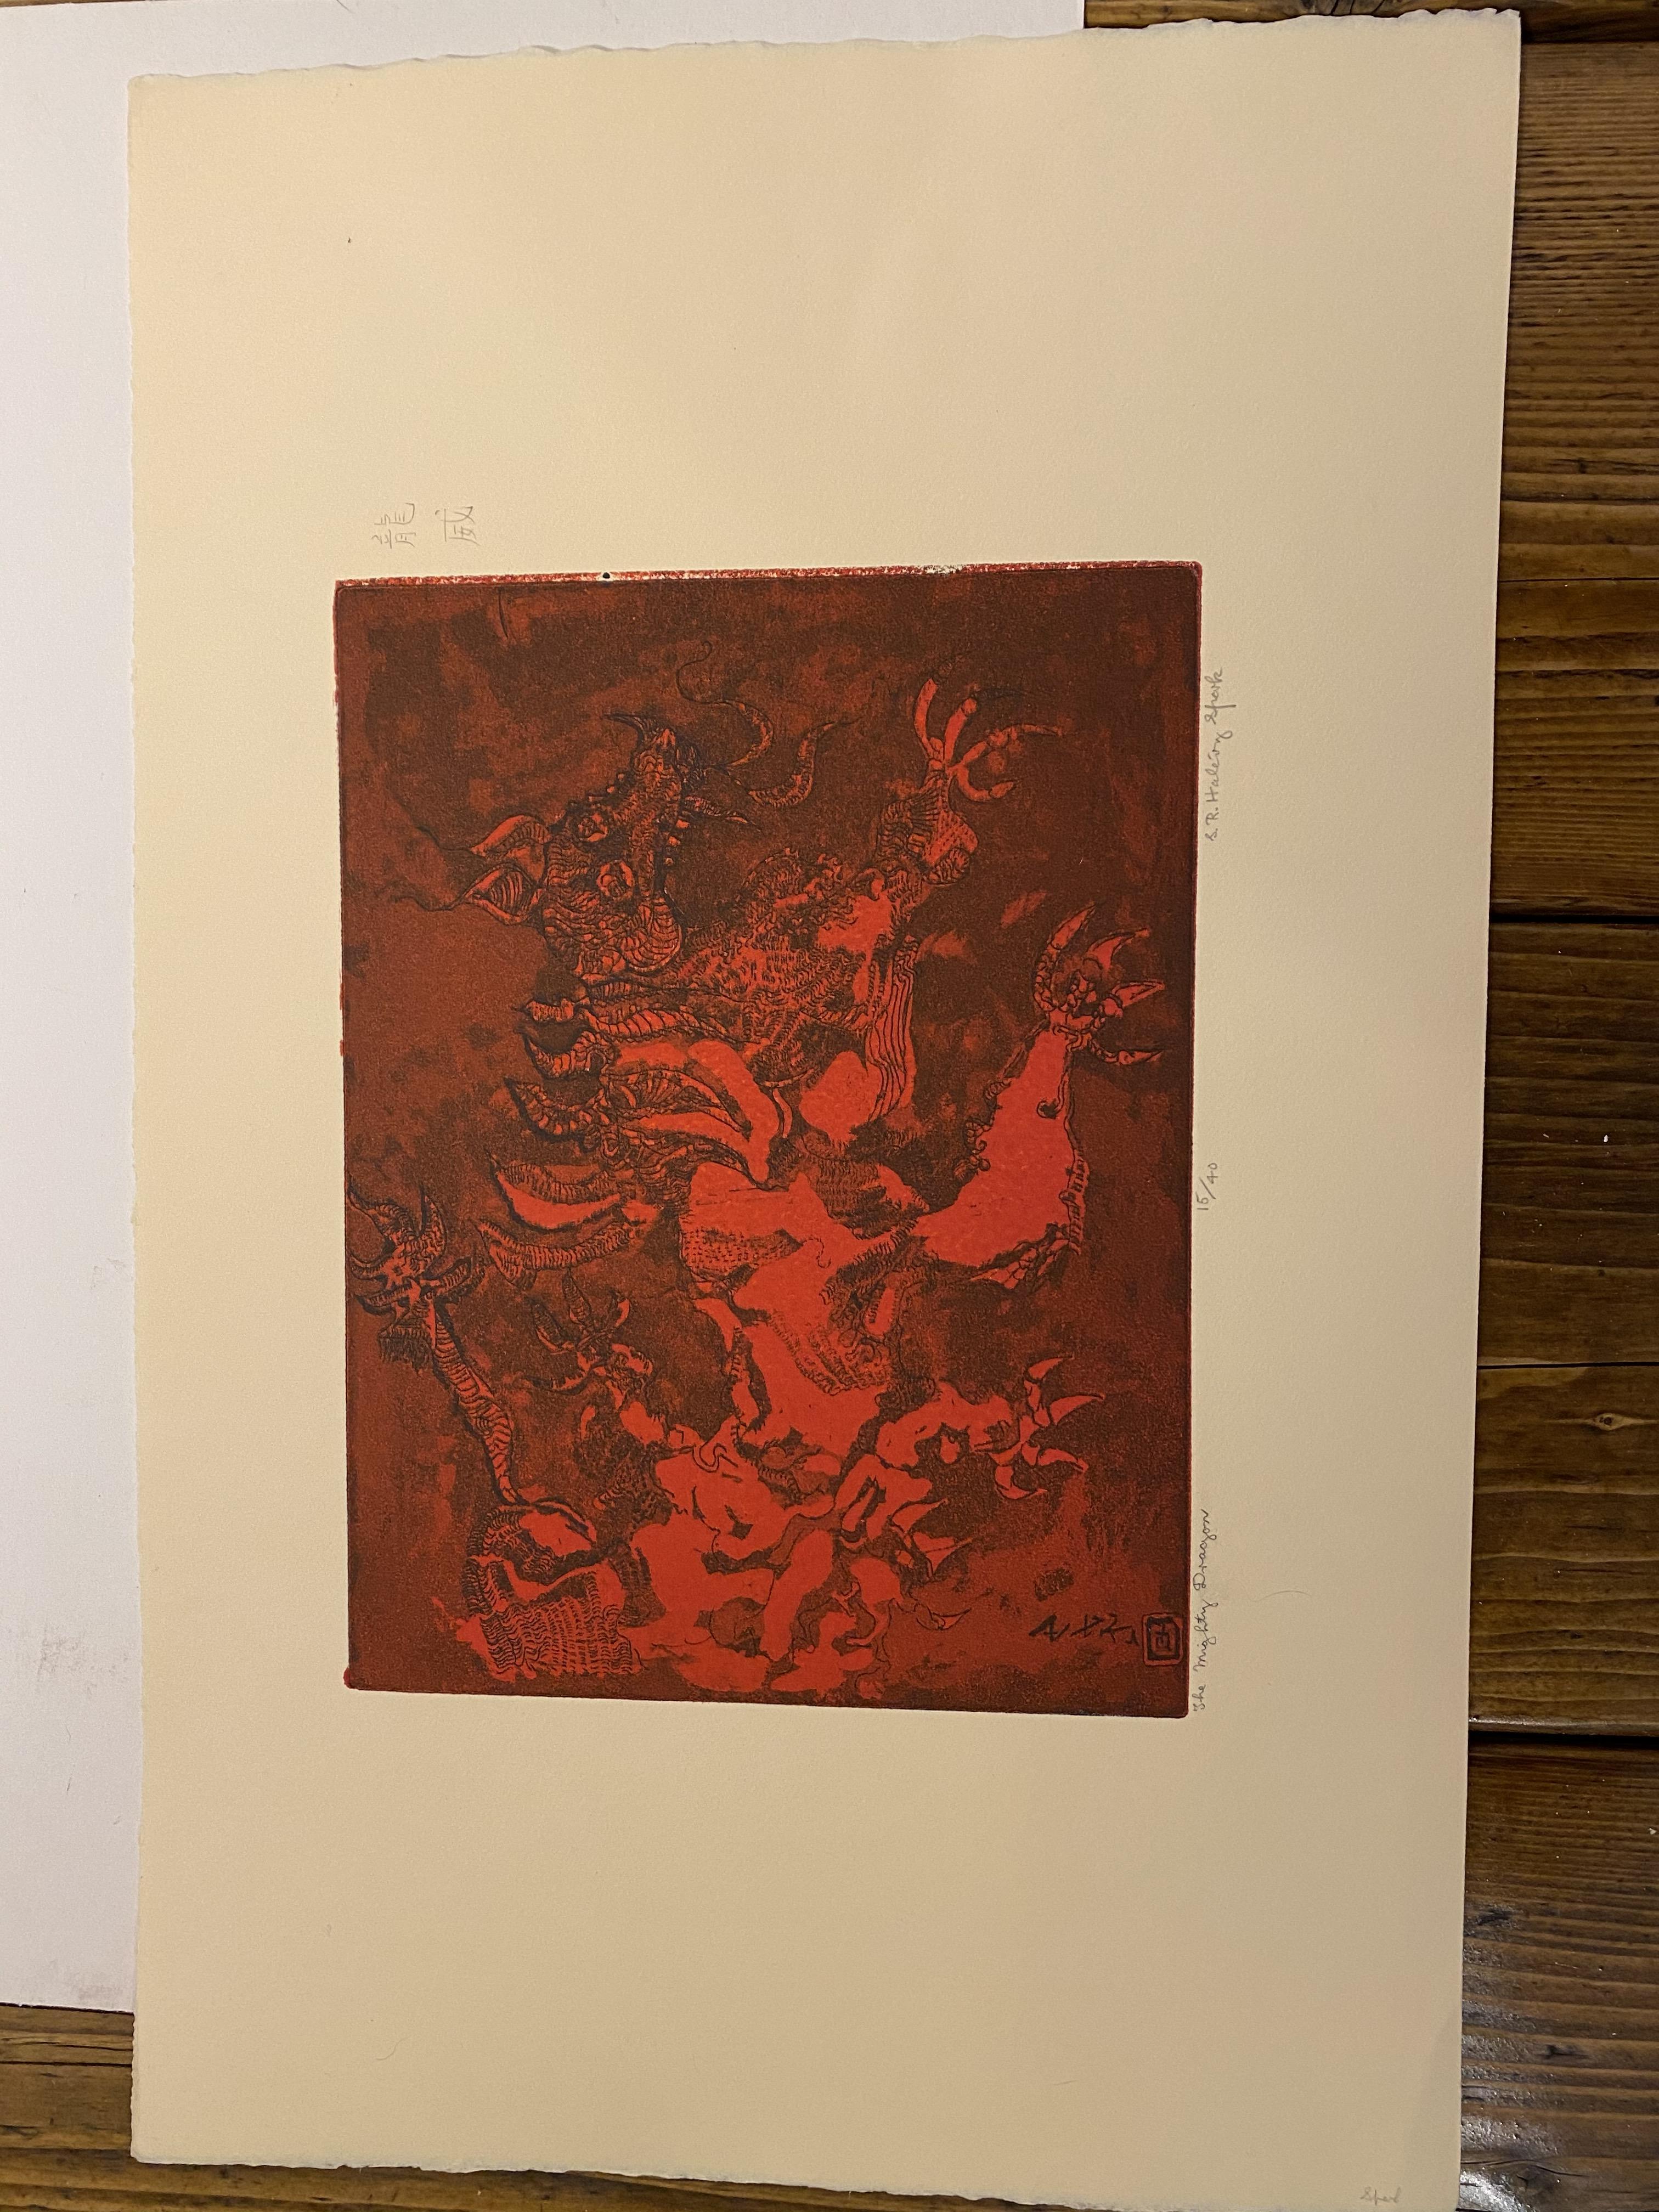 Samuel Robin Spark, The Mighty Dragon Limited Edition Print